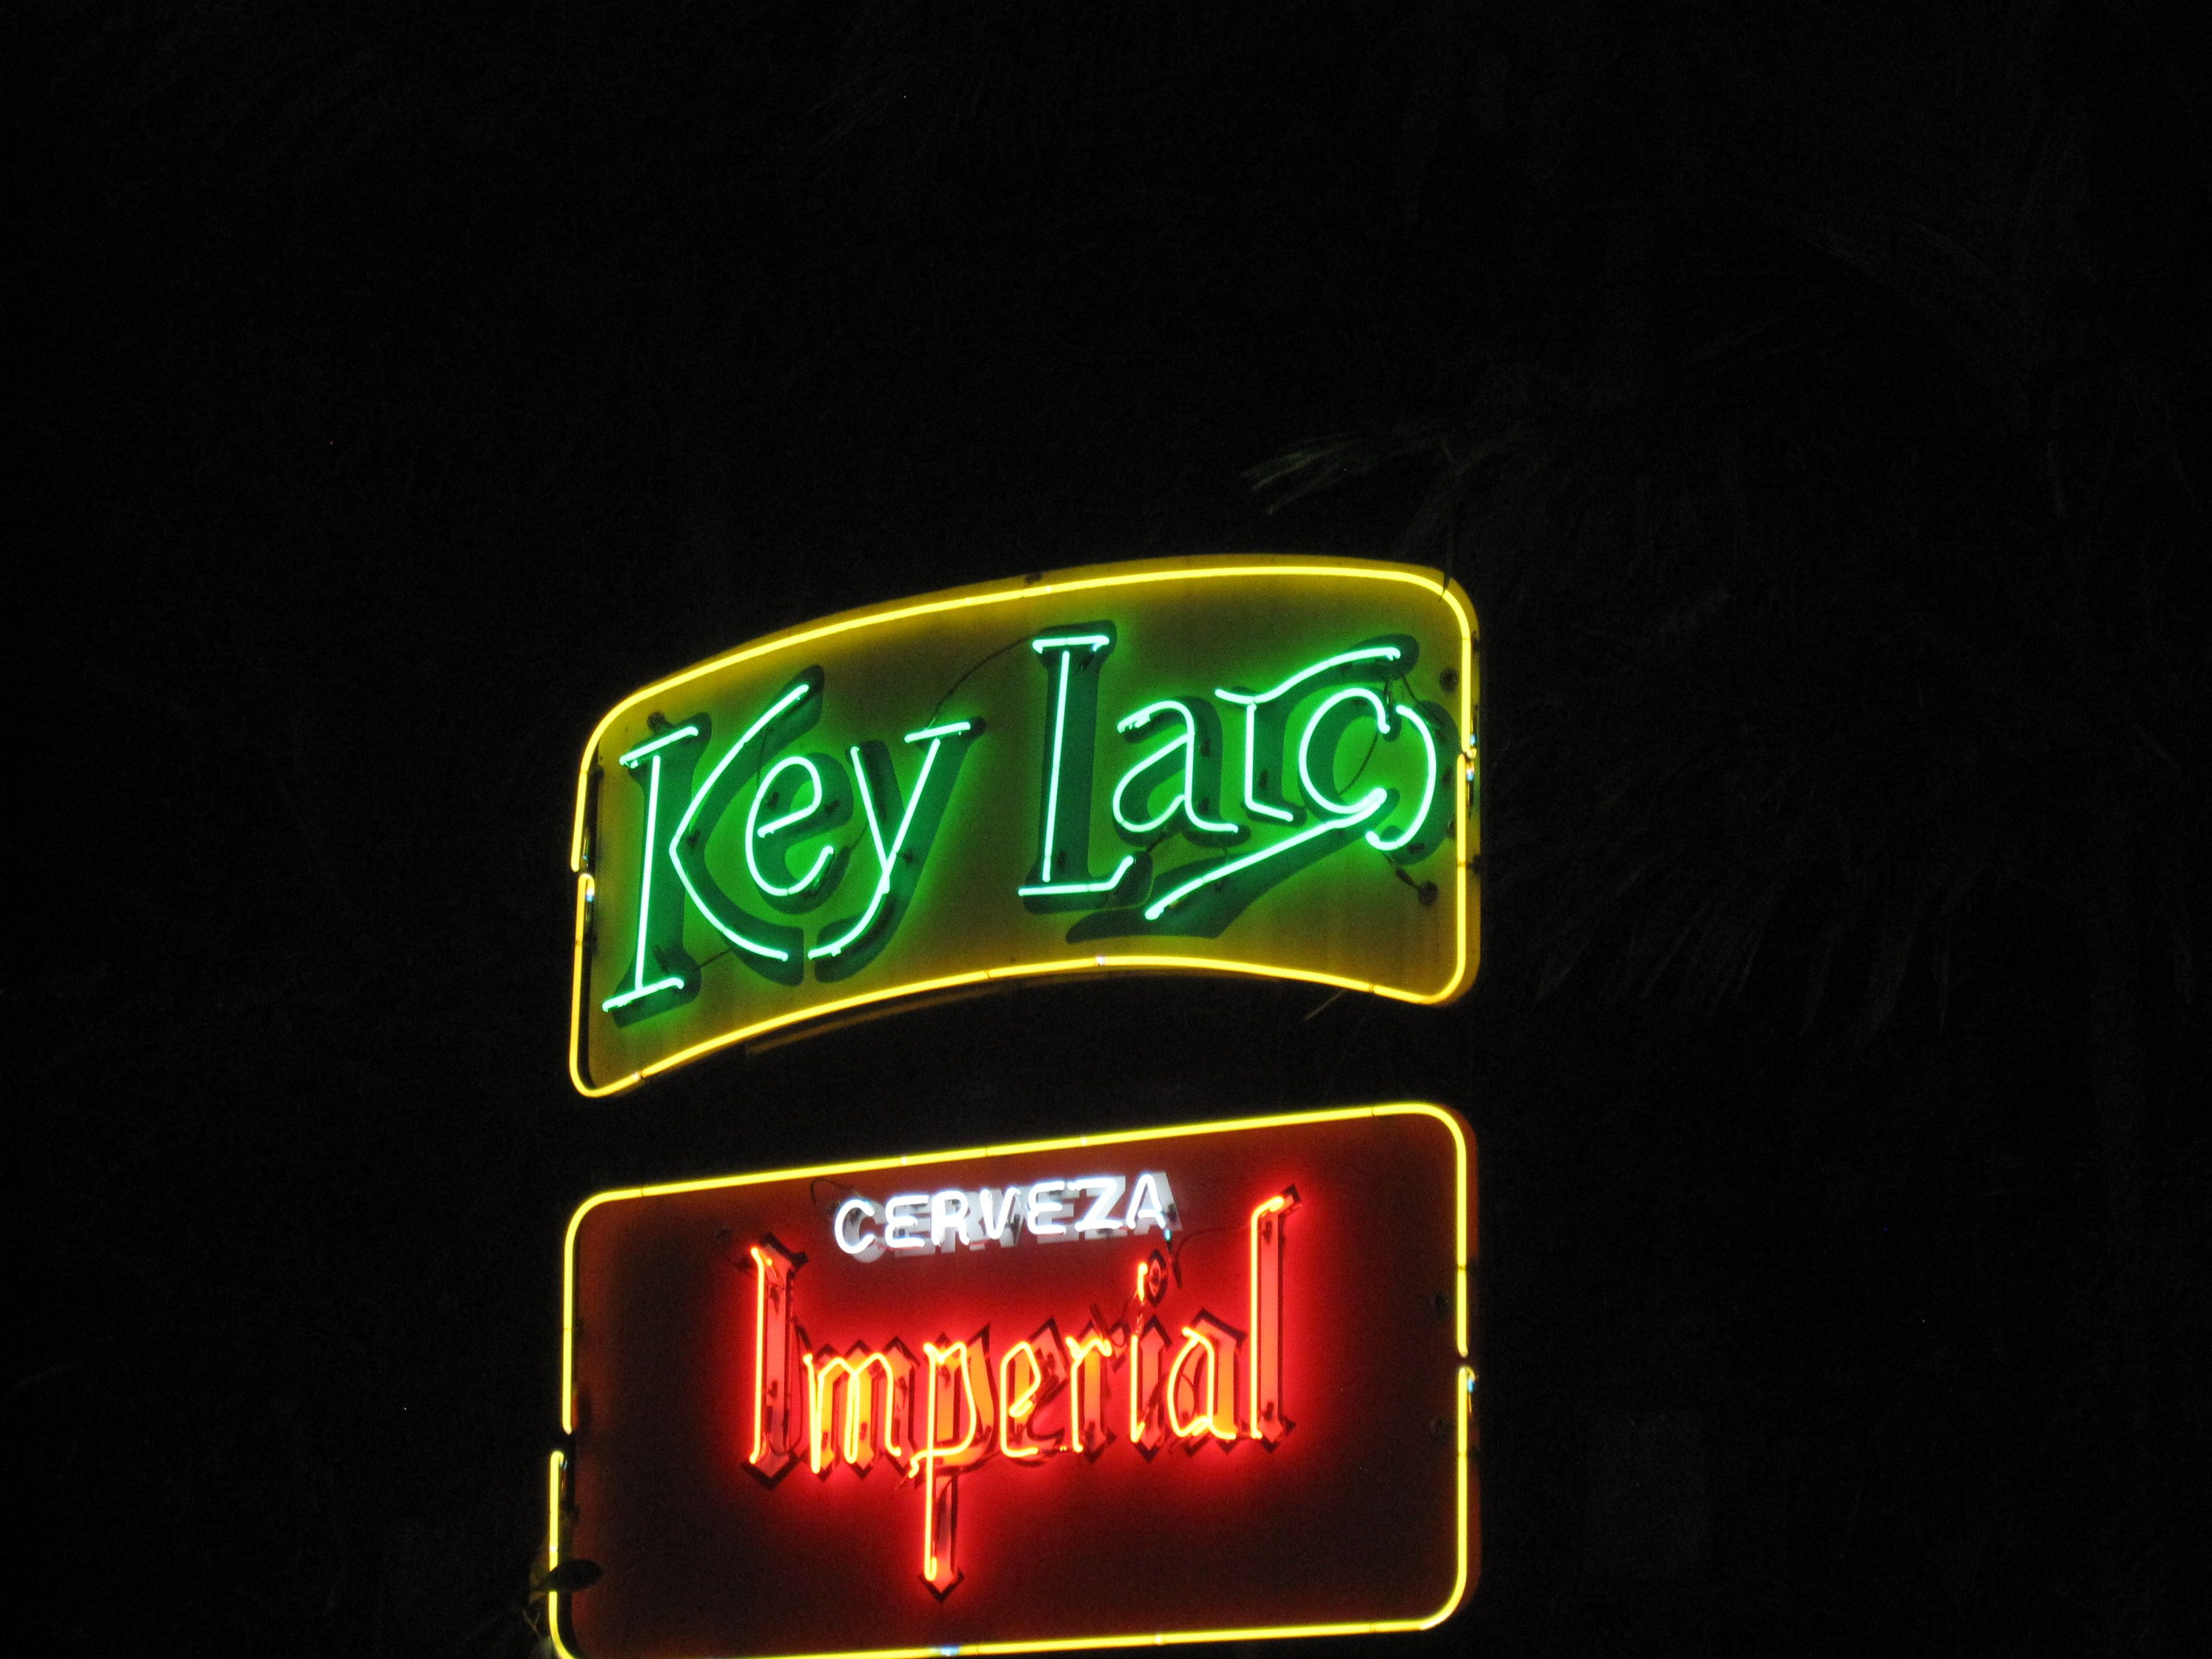 Key Largo In San Jose Hot Dance Club Across The Street From Del Rey Neon Words Neon Signs Neon